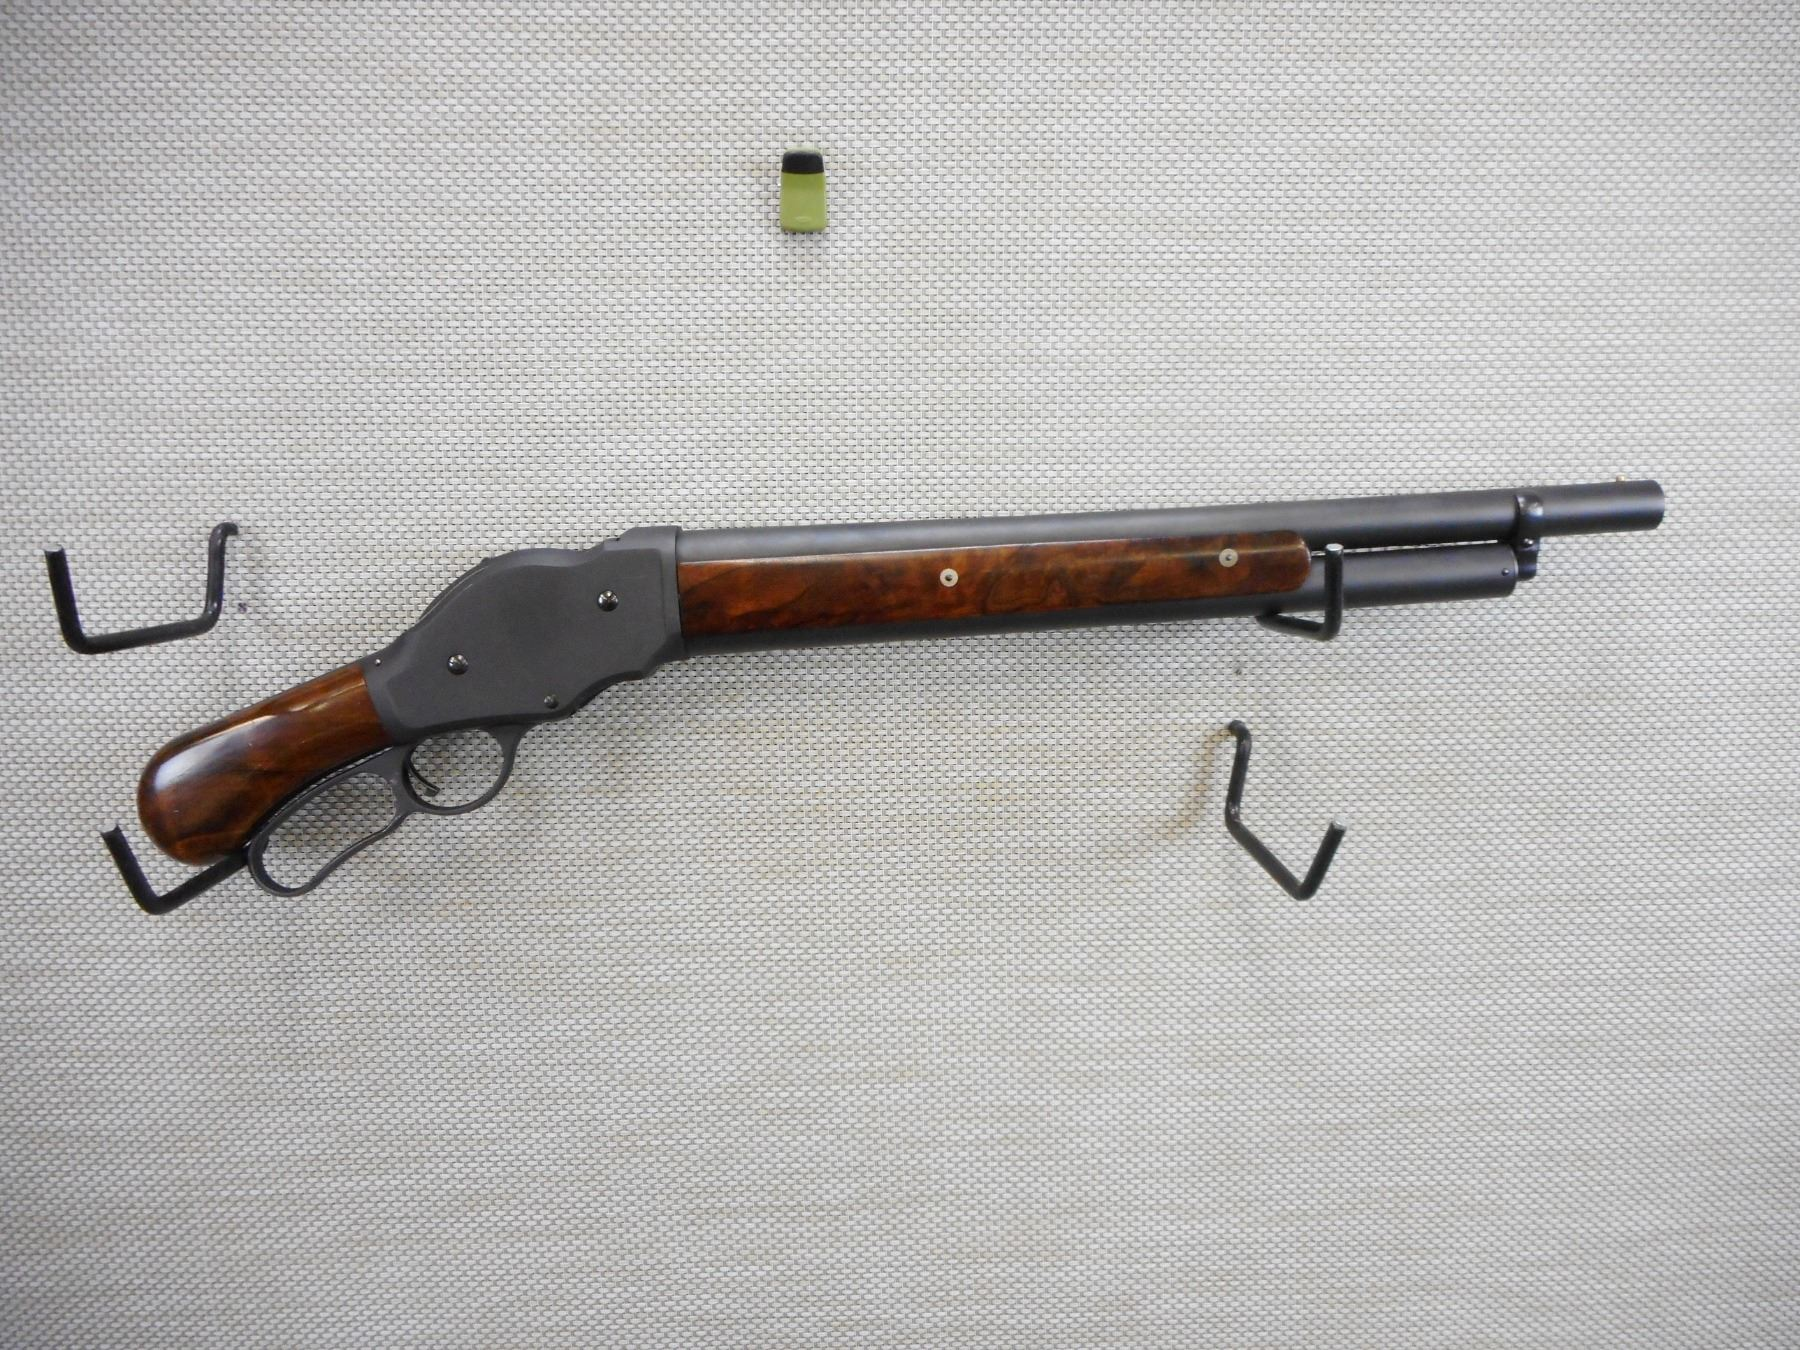 CHIAPPA, MODEL: 1887 REPRODUCTION MARES LEG , CALIBER: 12GA X 3